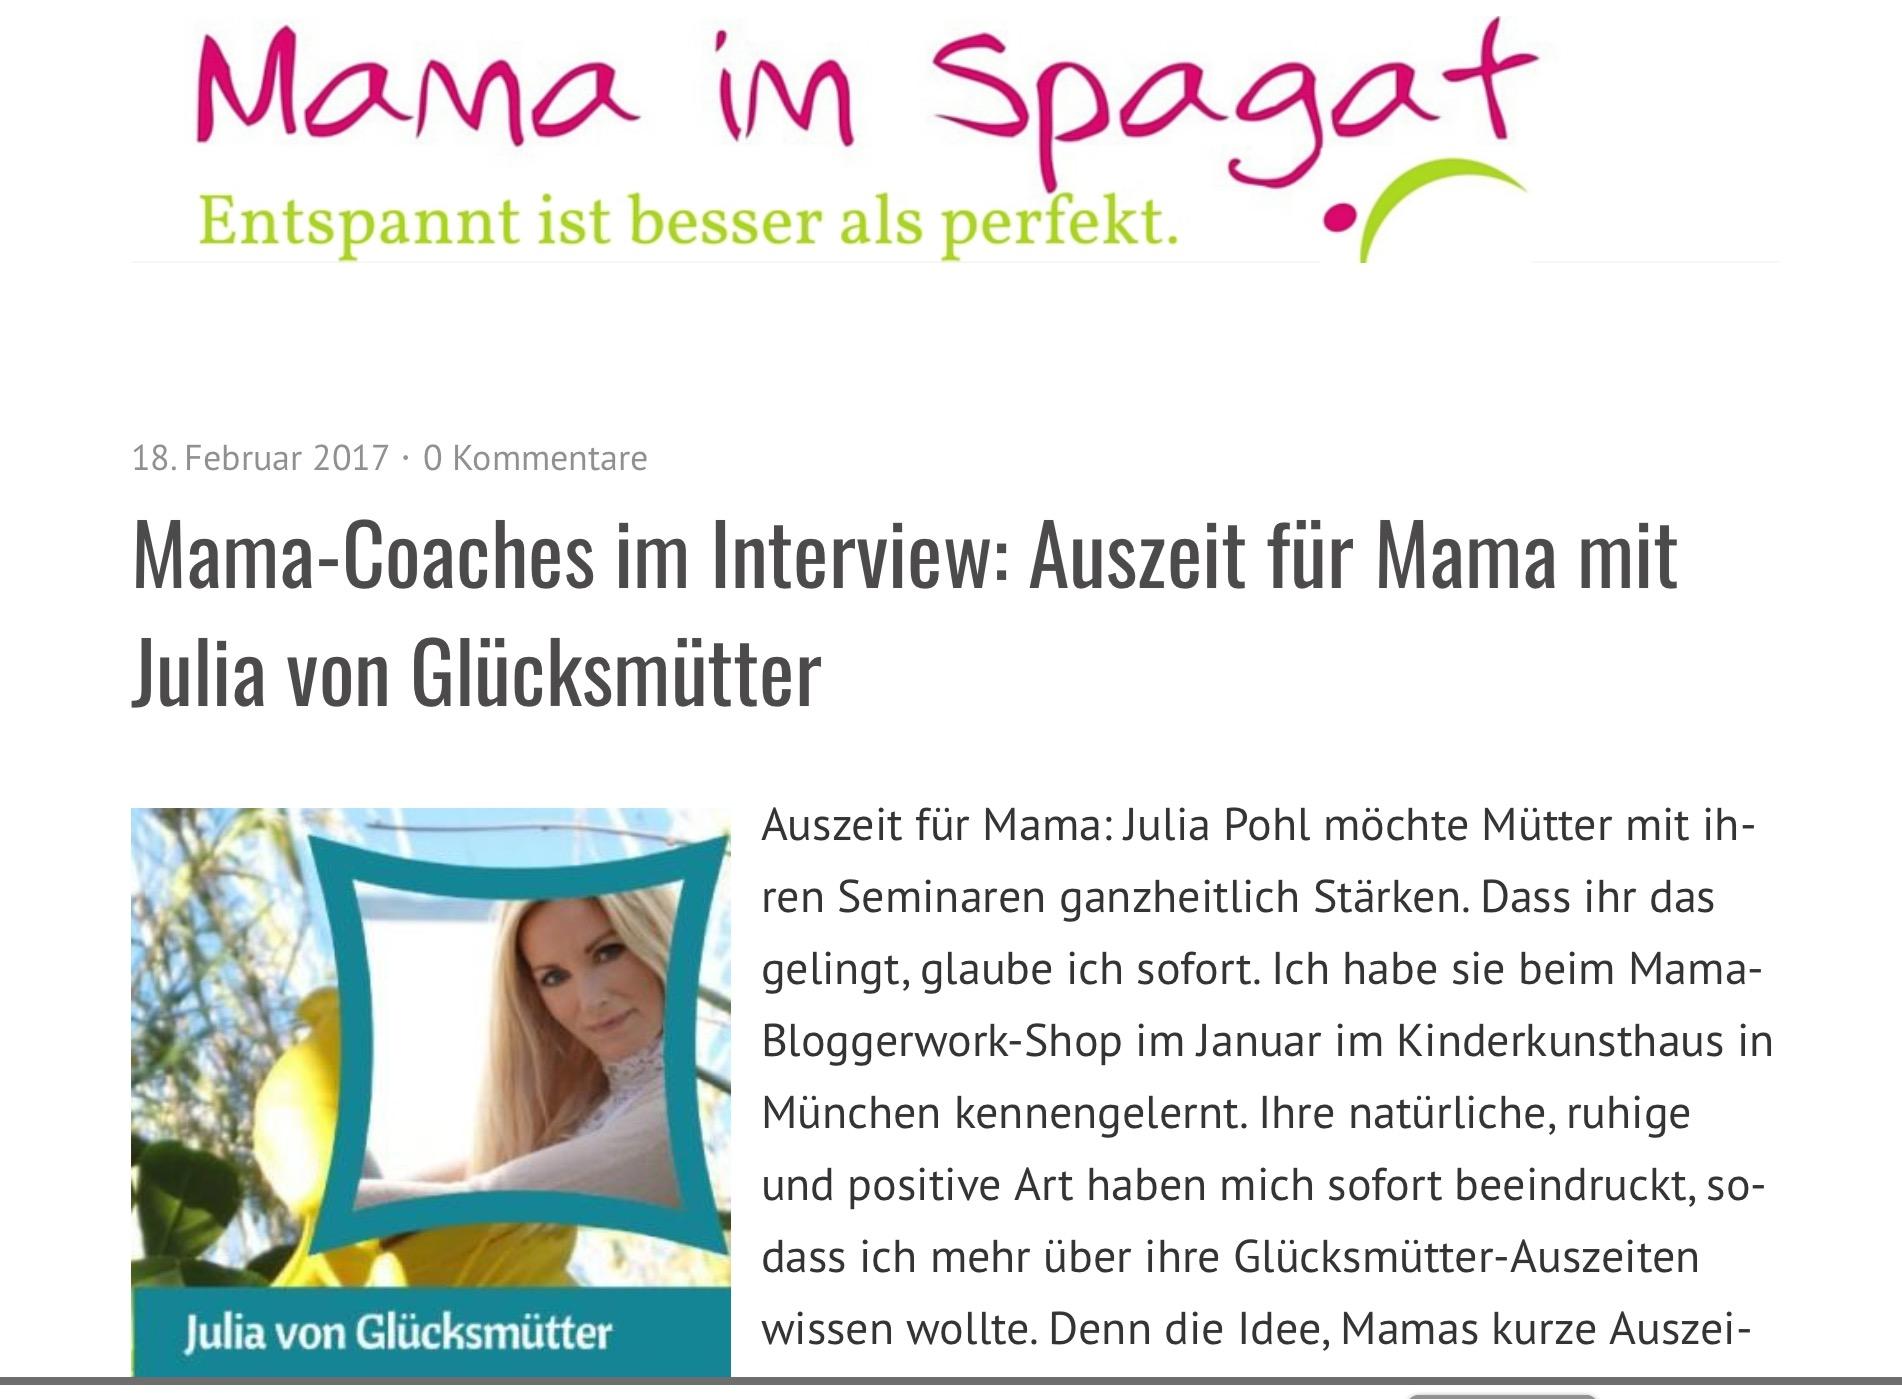 Gluecksmuetter_mamaimspagat